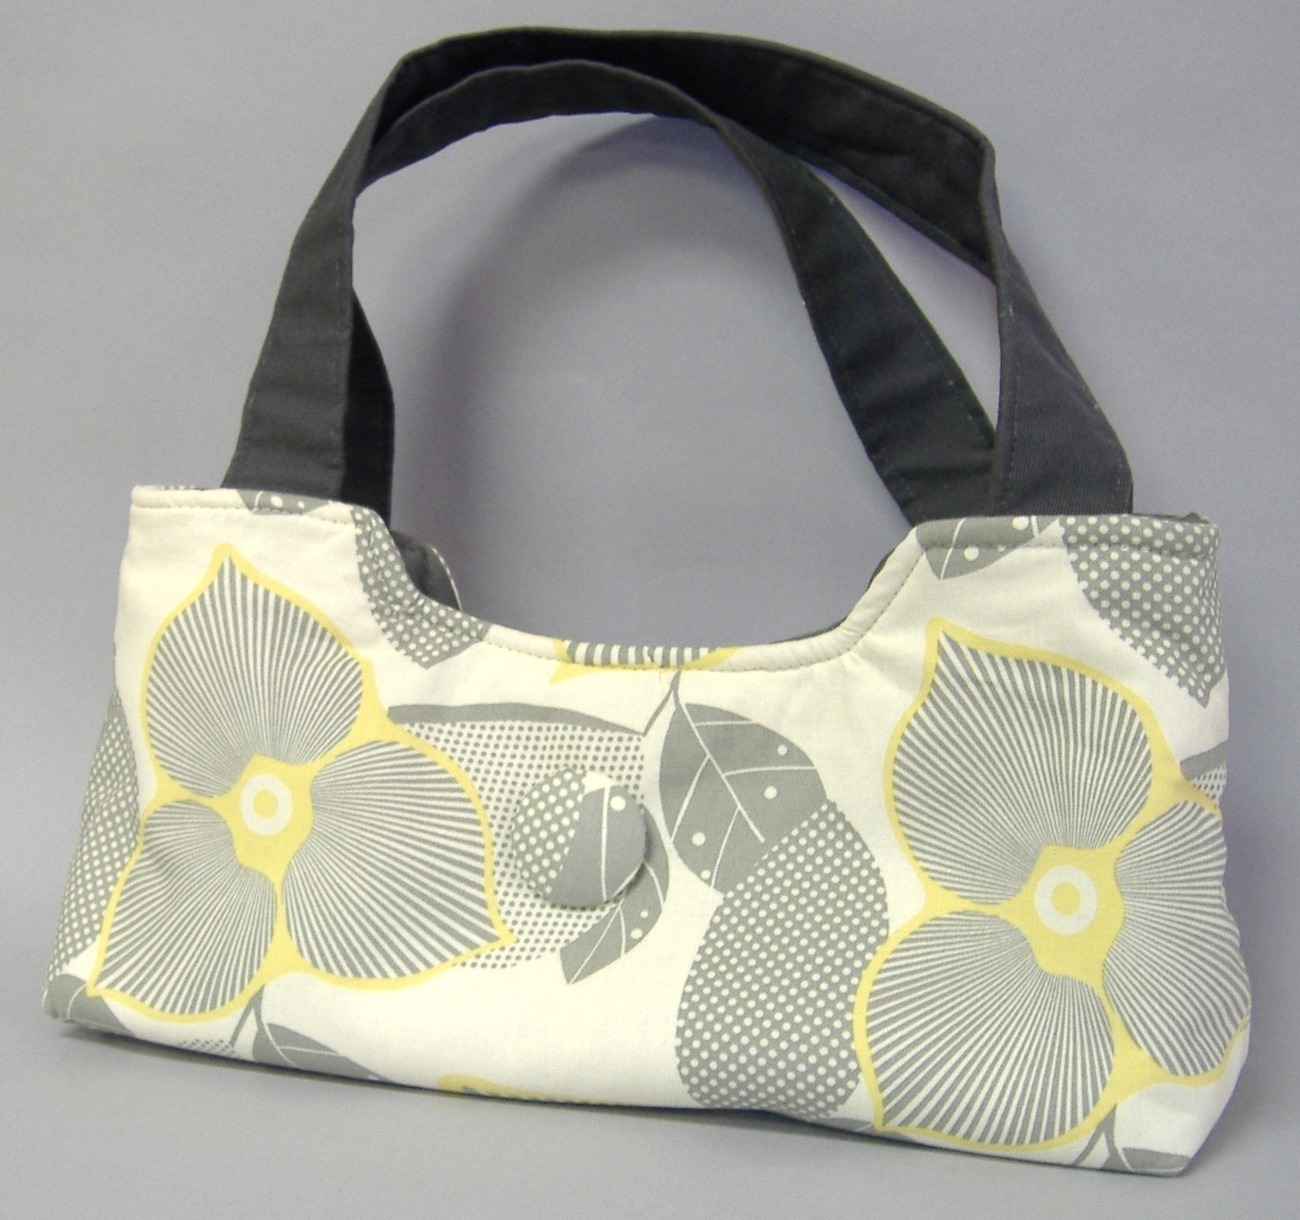 Morgan Floral Purse Chic Handbag Handcrafted Bag Tote Cotton Yellow Gray